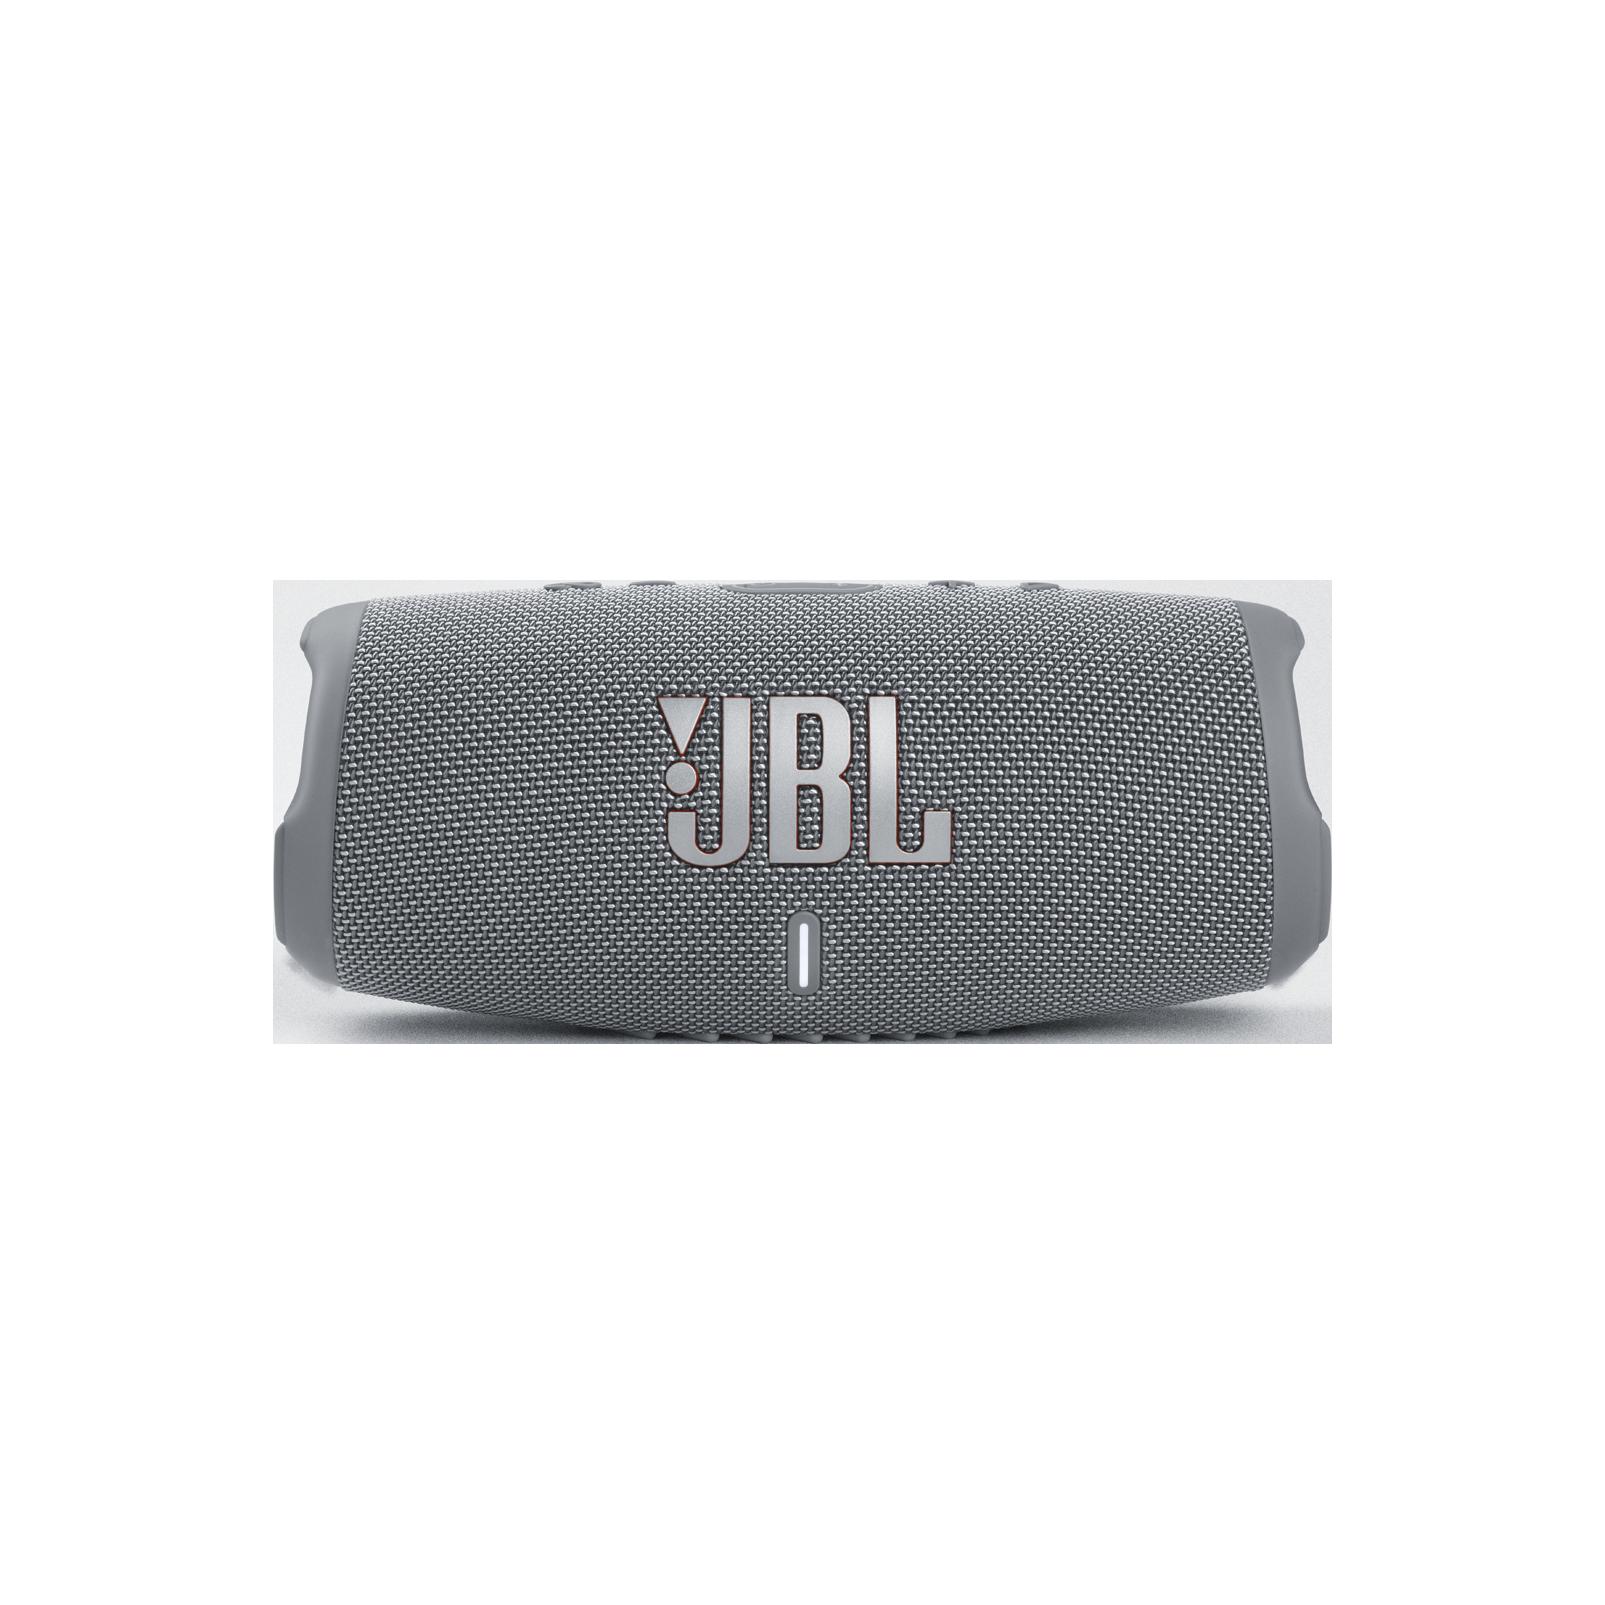 JBL Charge 5 - Grey - Portable Waterproof Speaker with Powerbank - Front